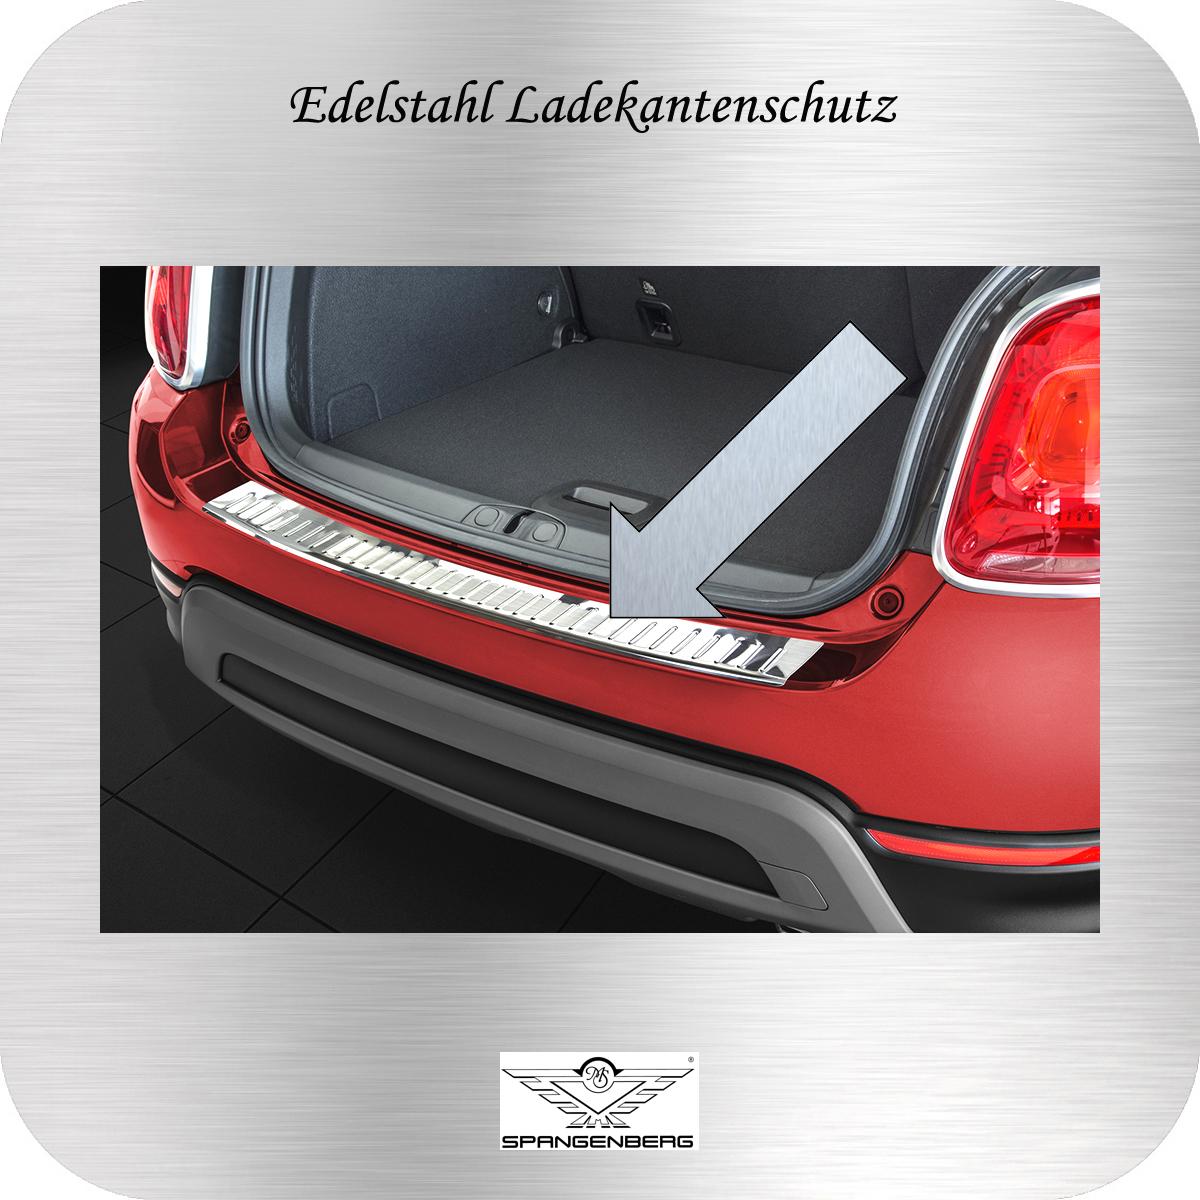 Ladekantenschutz Edelstahl Fiat 500X Mini SUV 2014- 3235900